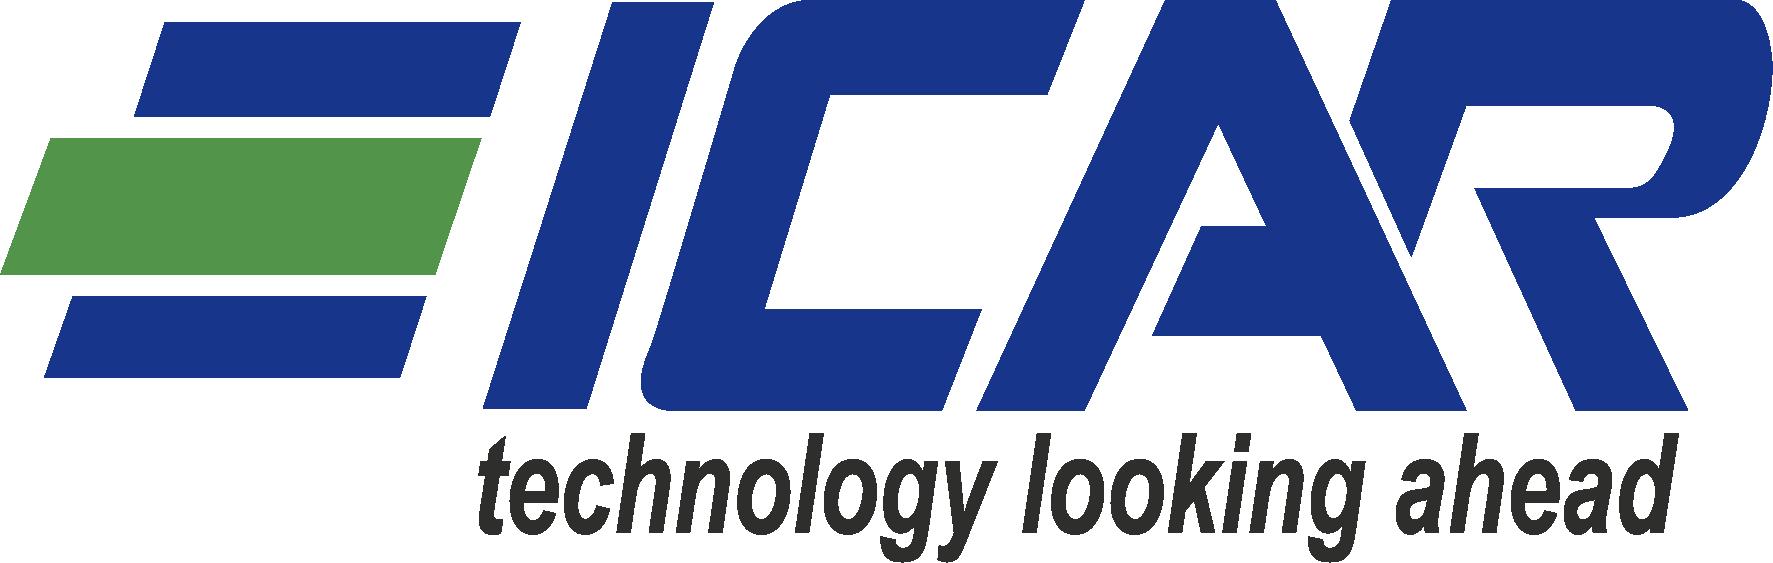 Icar Image